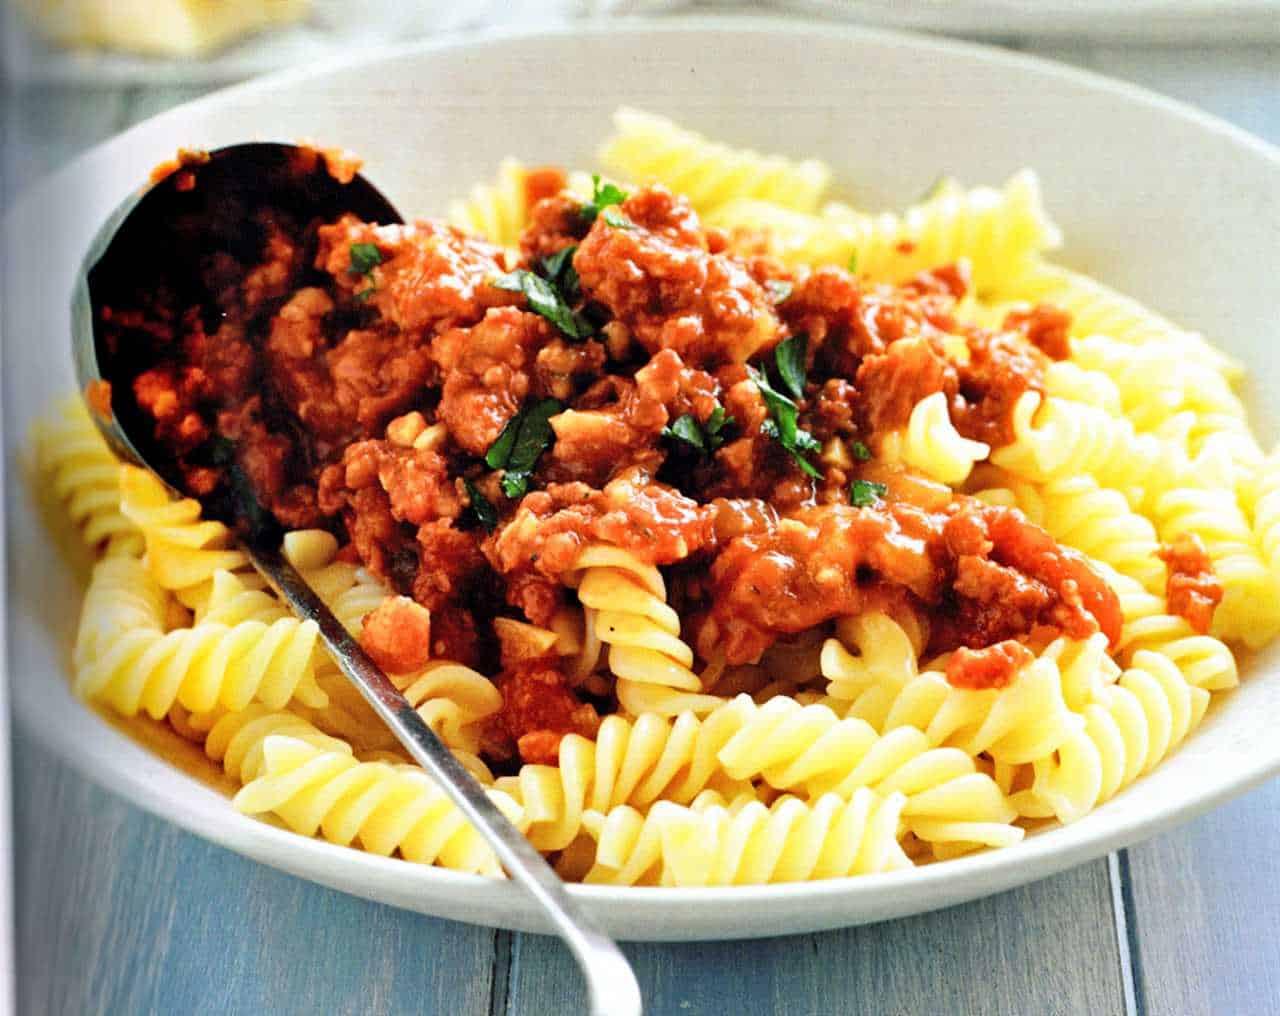 sausage regu pasta recipe-italian cooks country sausage ragu-easy-best-homemade-tips